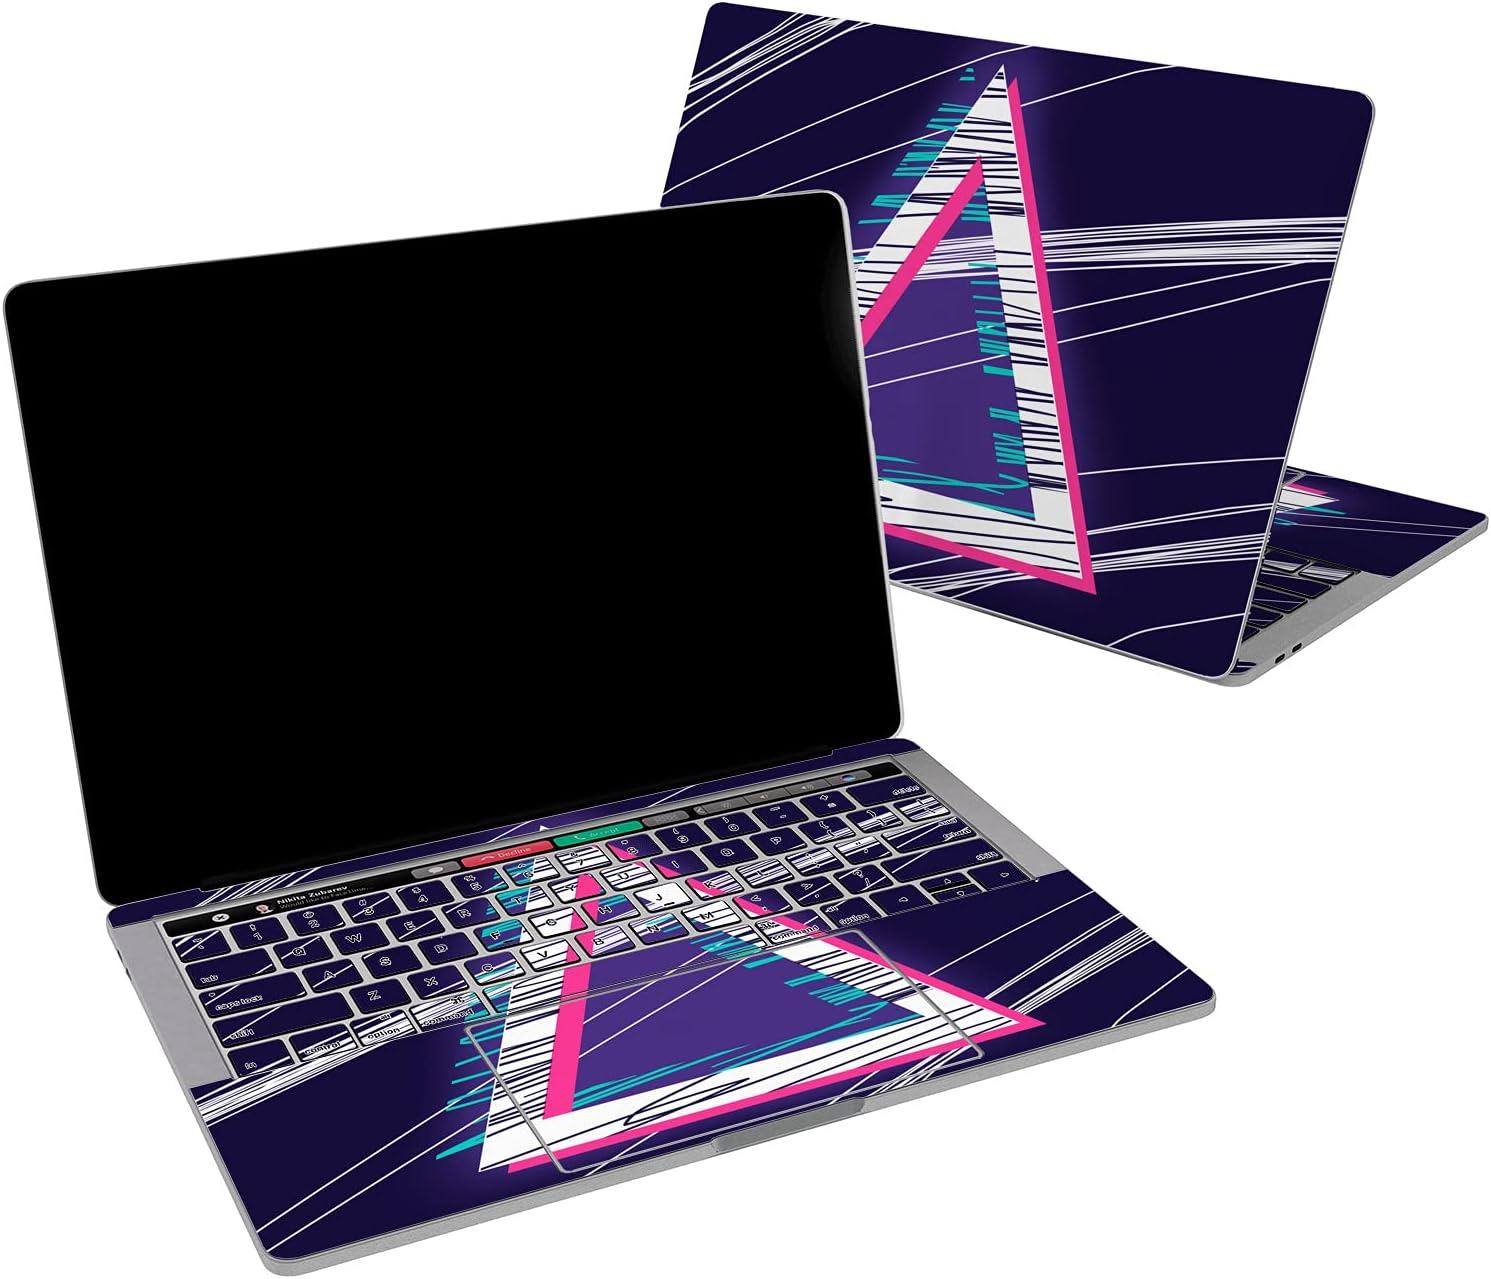 Lex Altern Vinyl Skin Washington Mall Compatible Max 48% OFF with inch 13 Air Pr Mac MacBook